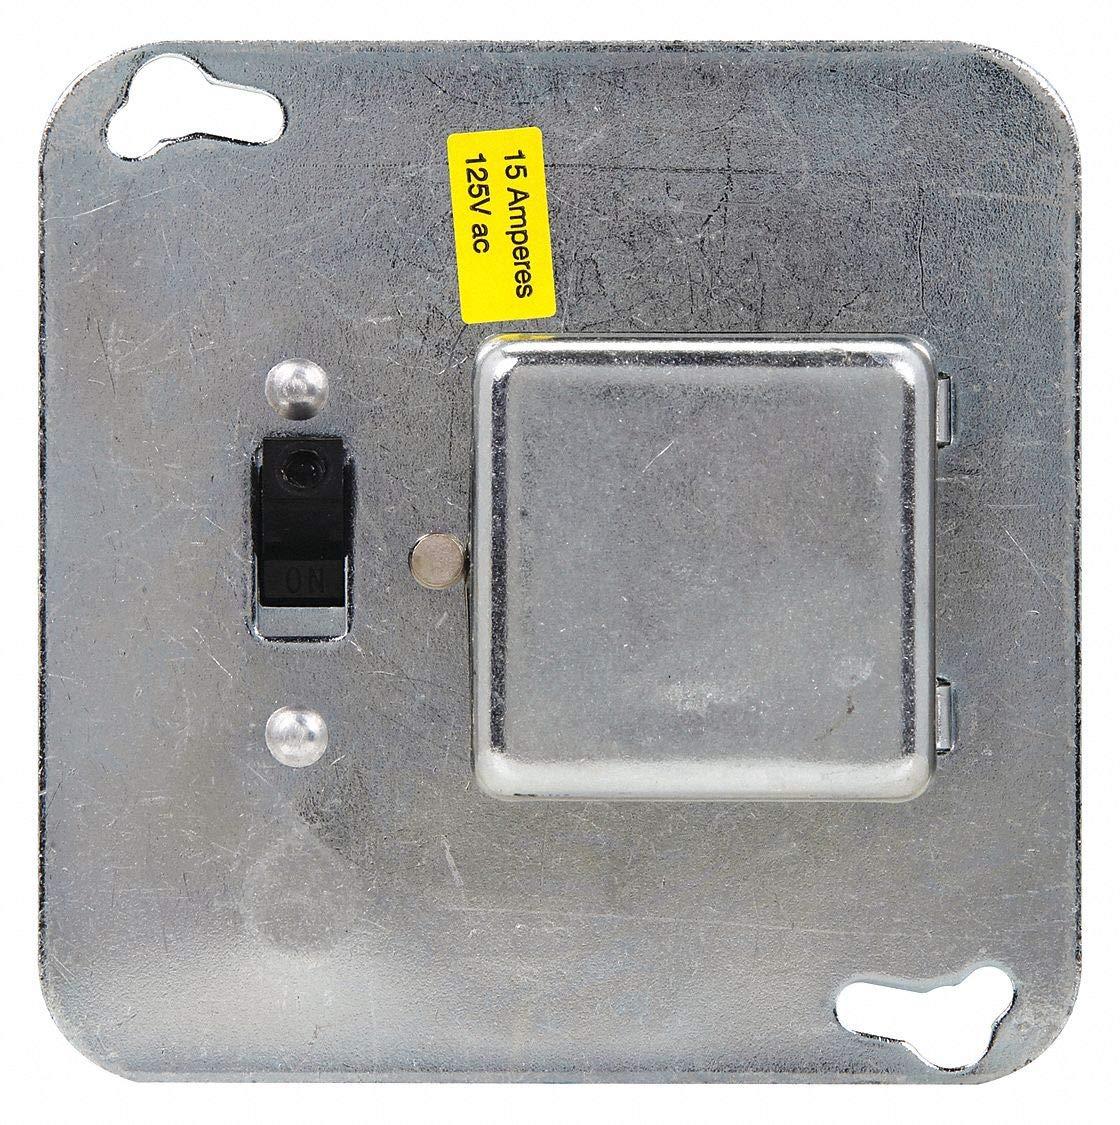 Eaton BUSSMANN Plug Fuse Box Cover Unit, 4